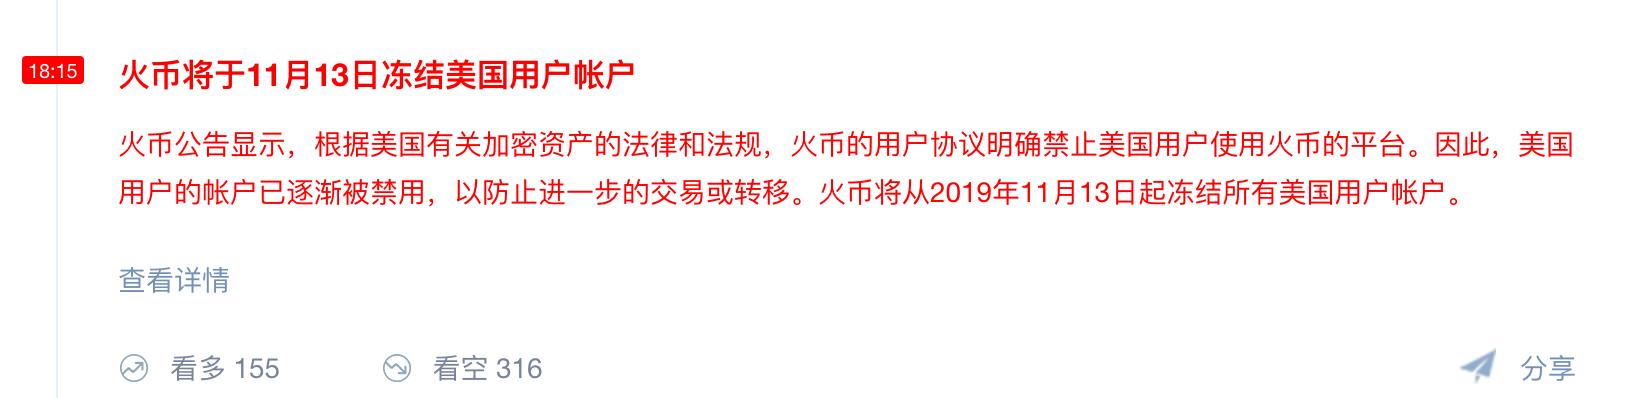 "Chino Según los informes, el Partido Comunista cumple funciones en el intercambio superior Huobi ""width ="" 1626 ""height ="" 398 ""srcset ="" https://news.bitcoin.com/wp-content/uploads/2019/11/screen-shot-2019-11 -05-at-12-23-07.png 1626w, https://news.bitcoin.com/wp-content/uploads/2019/11/screen-shot-2019-11-05-at-12-23- 07-300x73.png 300w, https://news.bitcoin.com/wp-content/uploads/2019/11/screen-shot-2019-11-05-at-12-23-07-768x188.png 768w, https://news.bitcoin.com/wp-content/uploads/2019/11/screen-shot-2019-11-05-at-12-23-07-1024x251.png 1024w, https: //news.b itcoin.com/wp-content/uploads/2019/11/screen-shot-2019-11-05-at-12-23-07-696x170.png 696w, https://news.bitcoin.com/wp-content /uploads/2019/11/screen-shot-2019-11-05-at-12-23-07-1392x341.png 1392w, https://news.bitcoin.com/wp-content/uploads/2019/11/ screen-shot-2019-11-05-at-12-23-07-1068x261.png 1068w ""tamaños ="" (ancho máximo: 1626px) 100vw, 1626px"